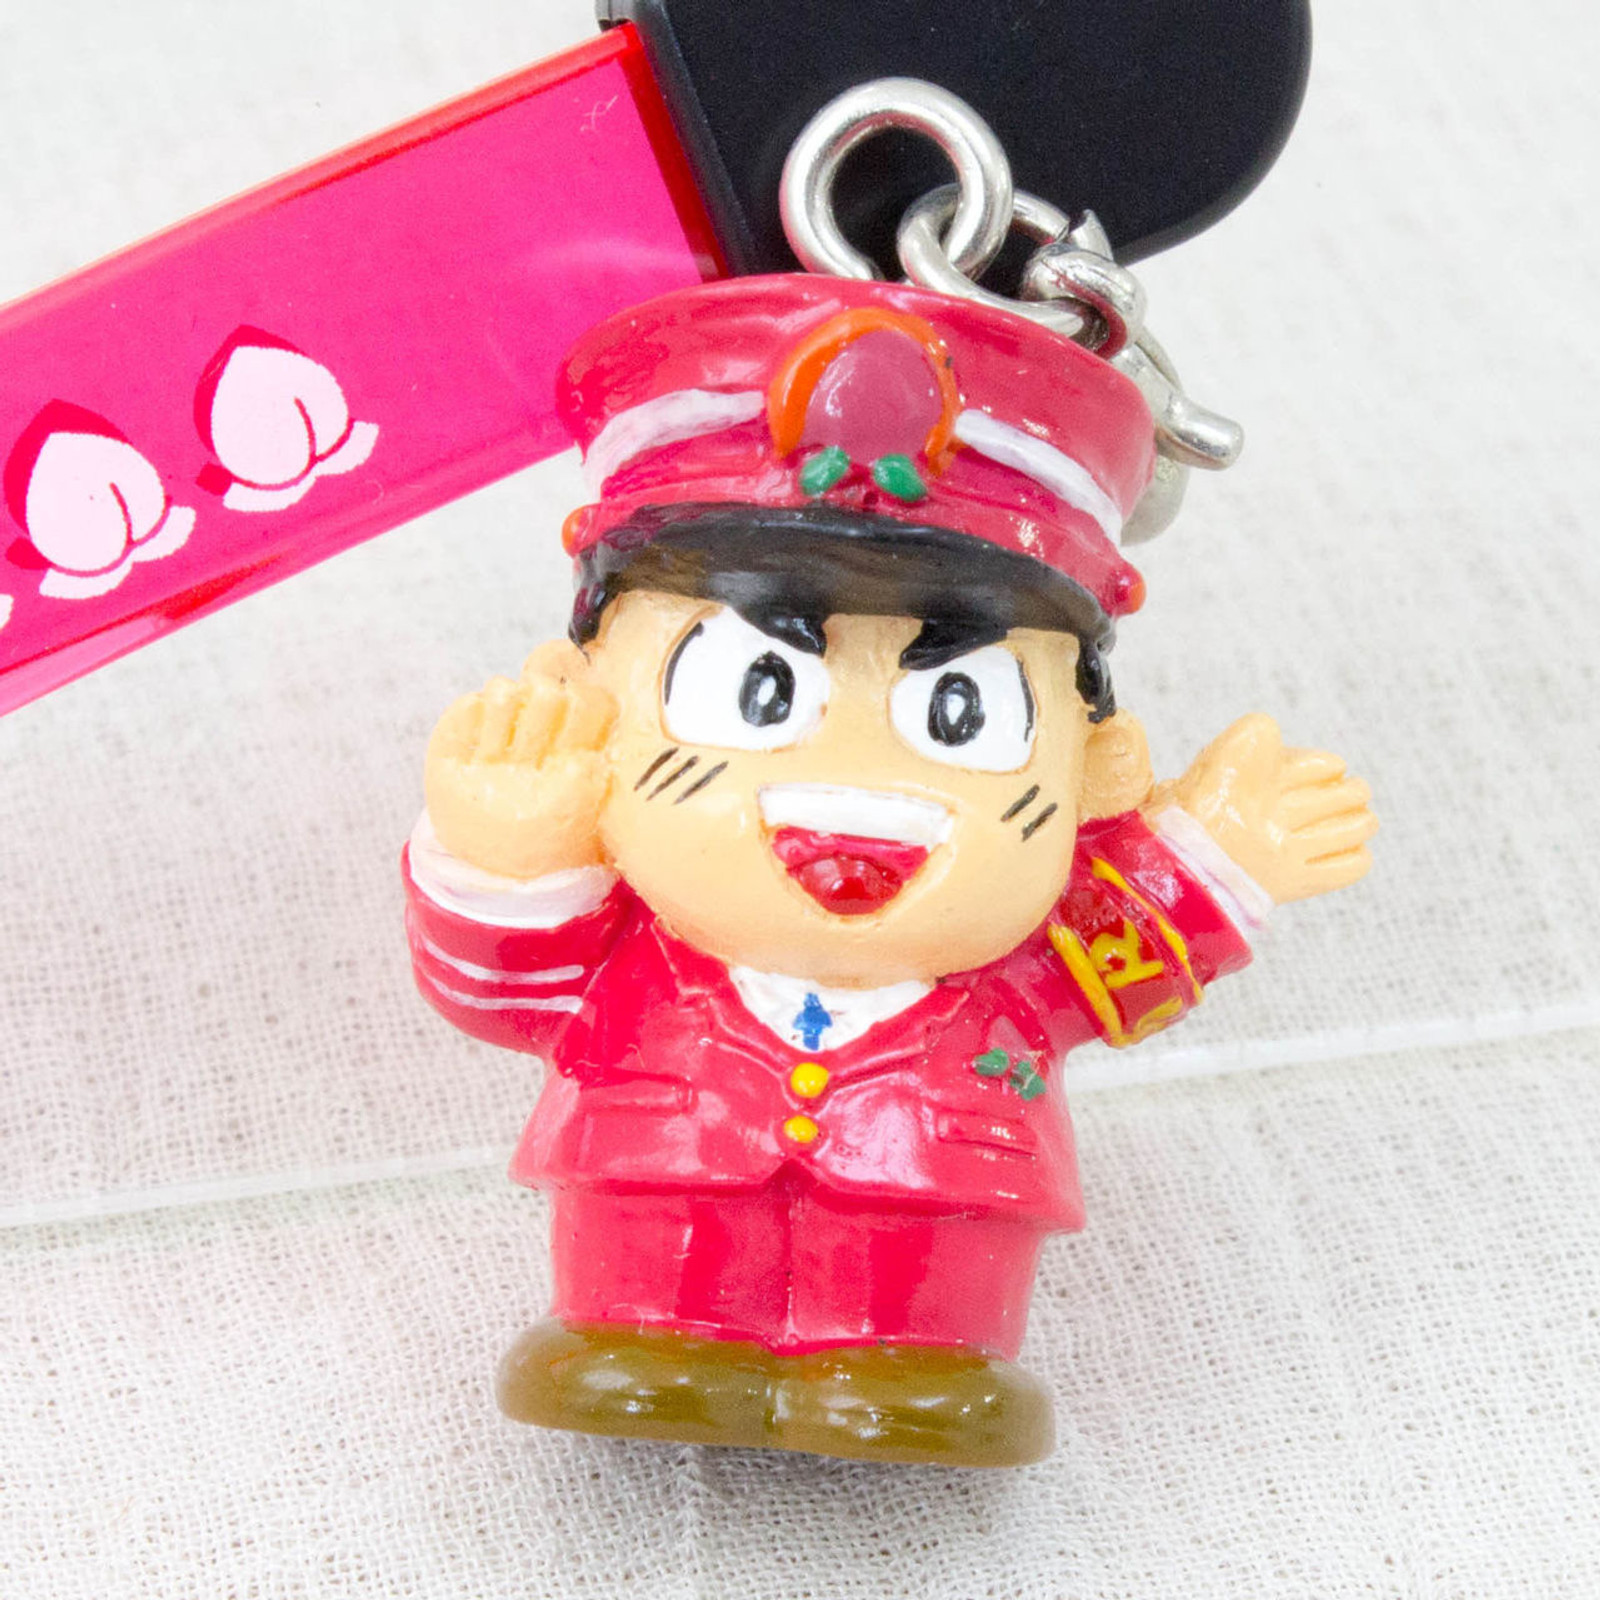 Momotaro Dentetsu Mascot Figure Strap Hudson Momotetsu JAPAN ANIME GAME